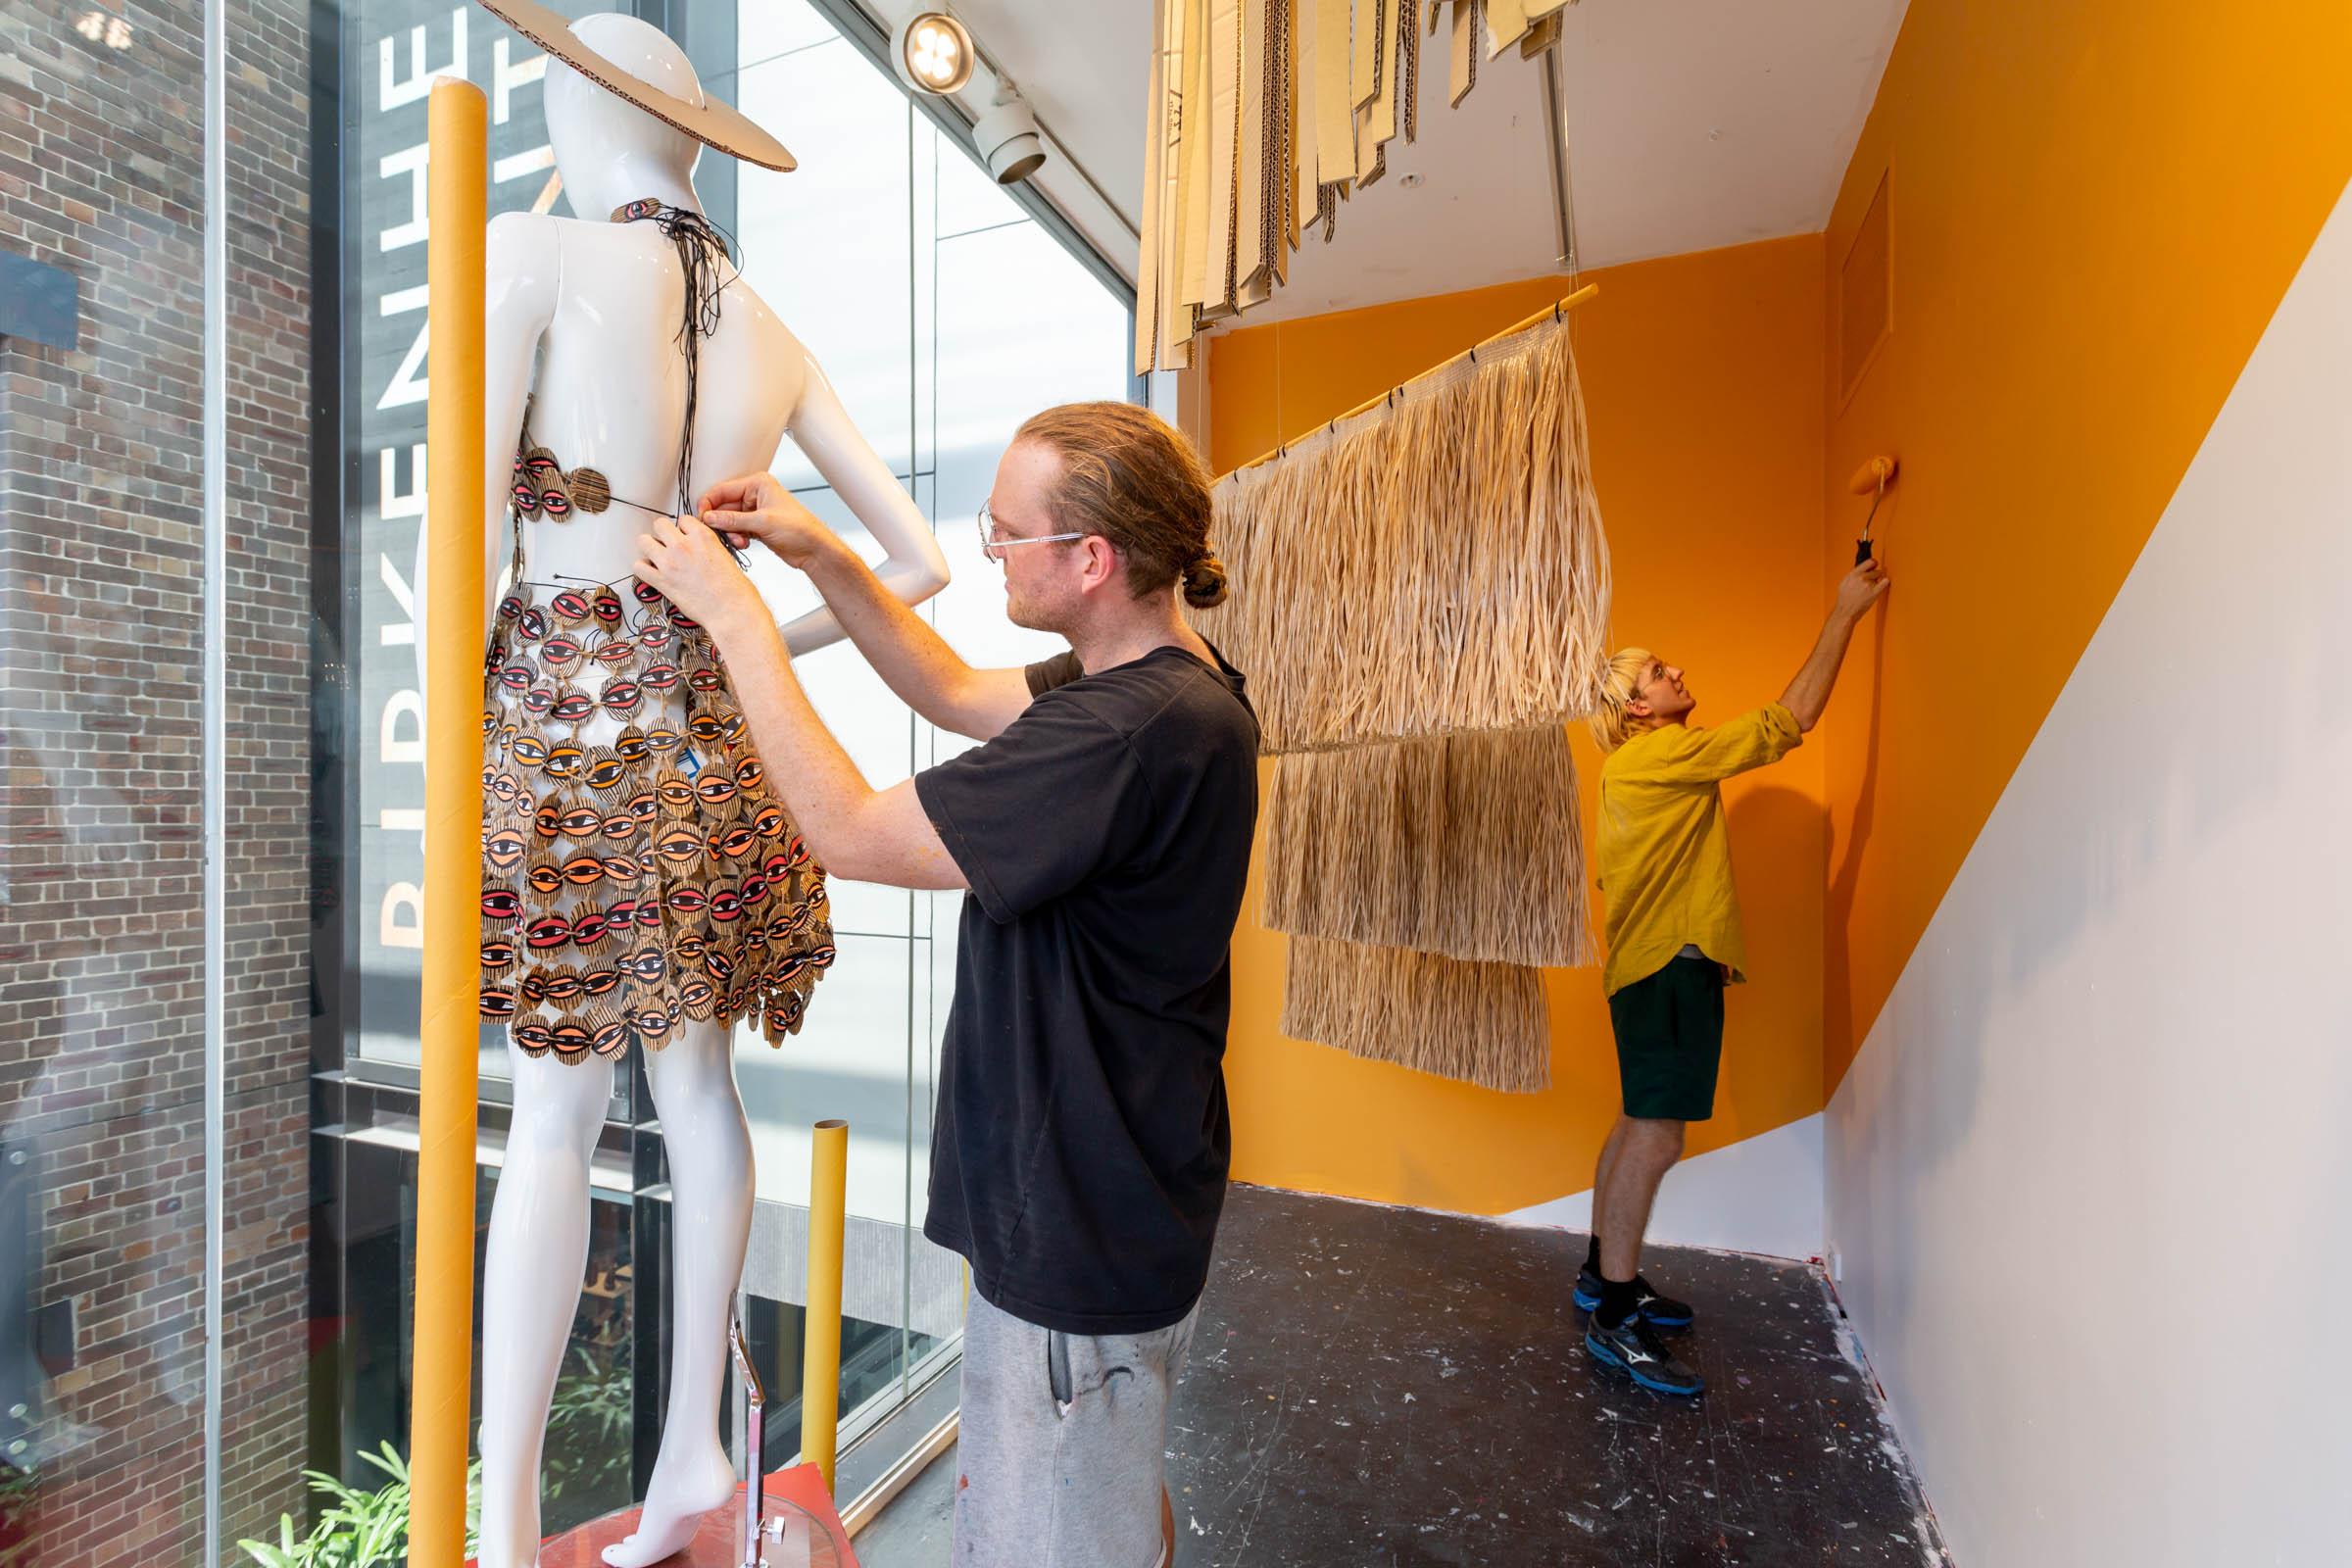 Jeff McCann's installation at Birkenhead Point. Image Credit: Art Pharmacy Consulting / Jodie Barker